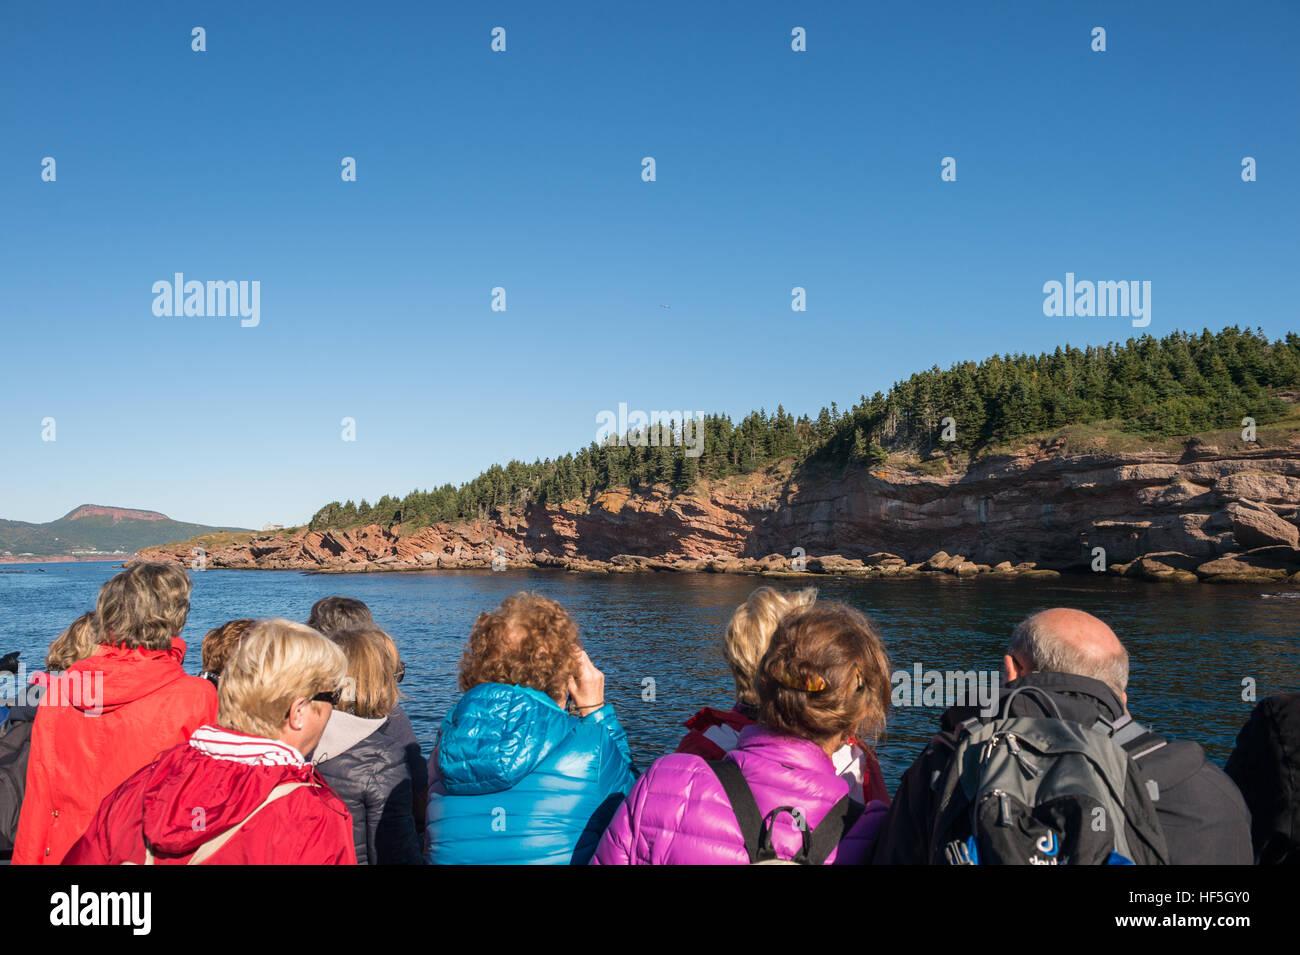 Tourists on a boat arriving on Bonaventure Island, Gaspe Peninsula, Quebec, - Stock Image